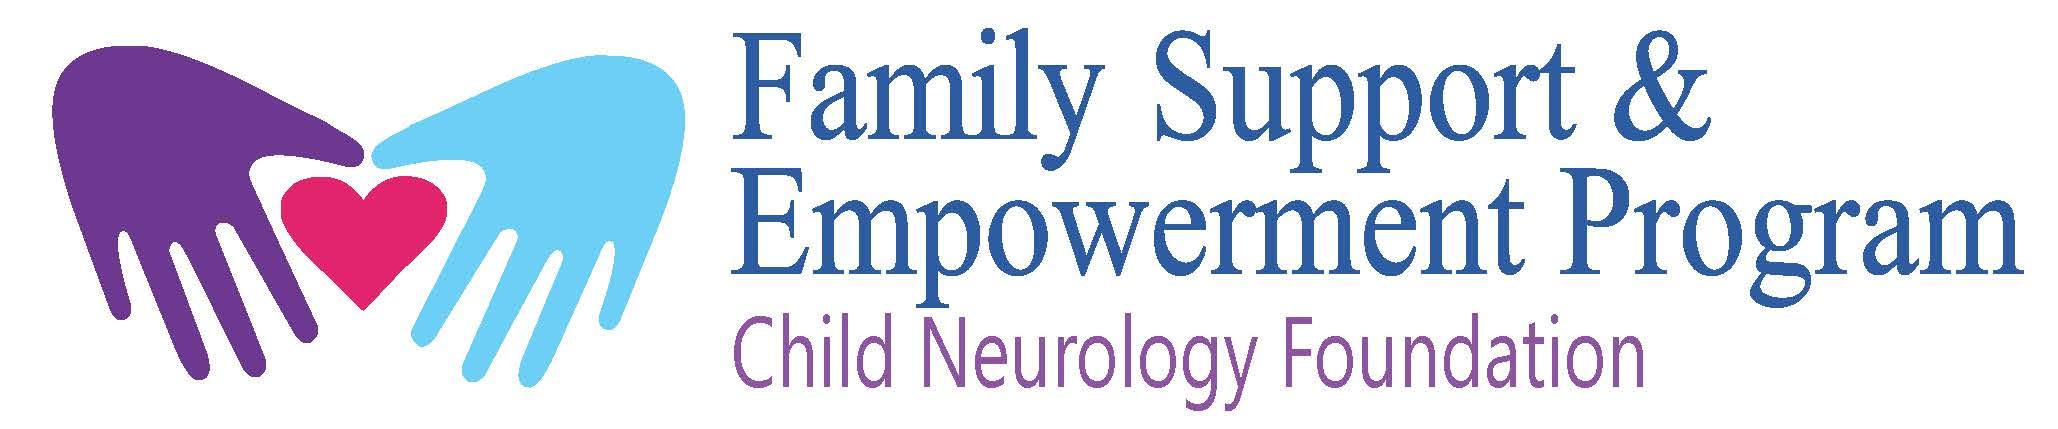 support children's colorado foundation - 2058×429